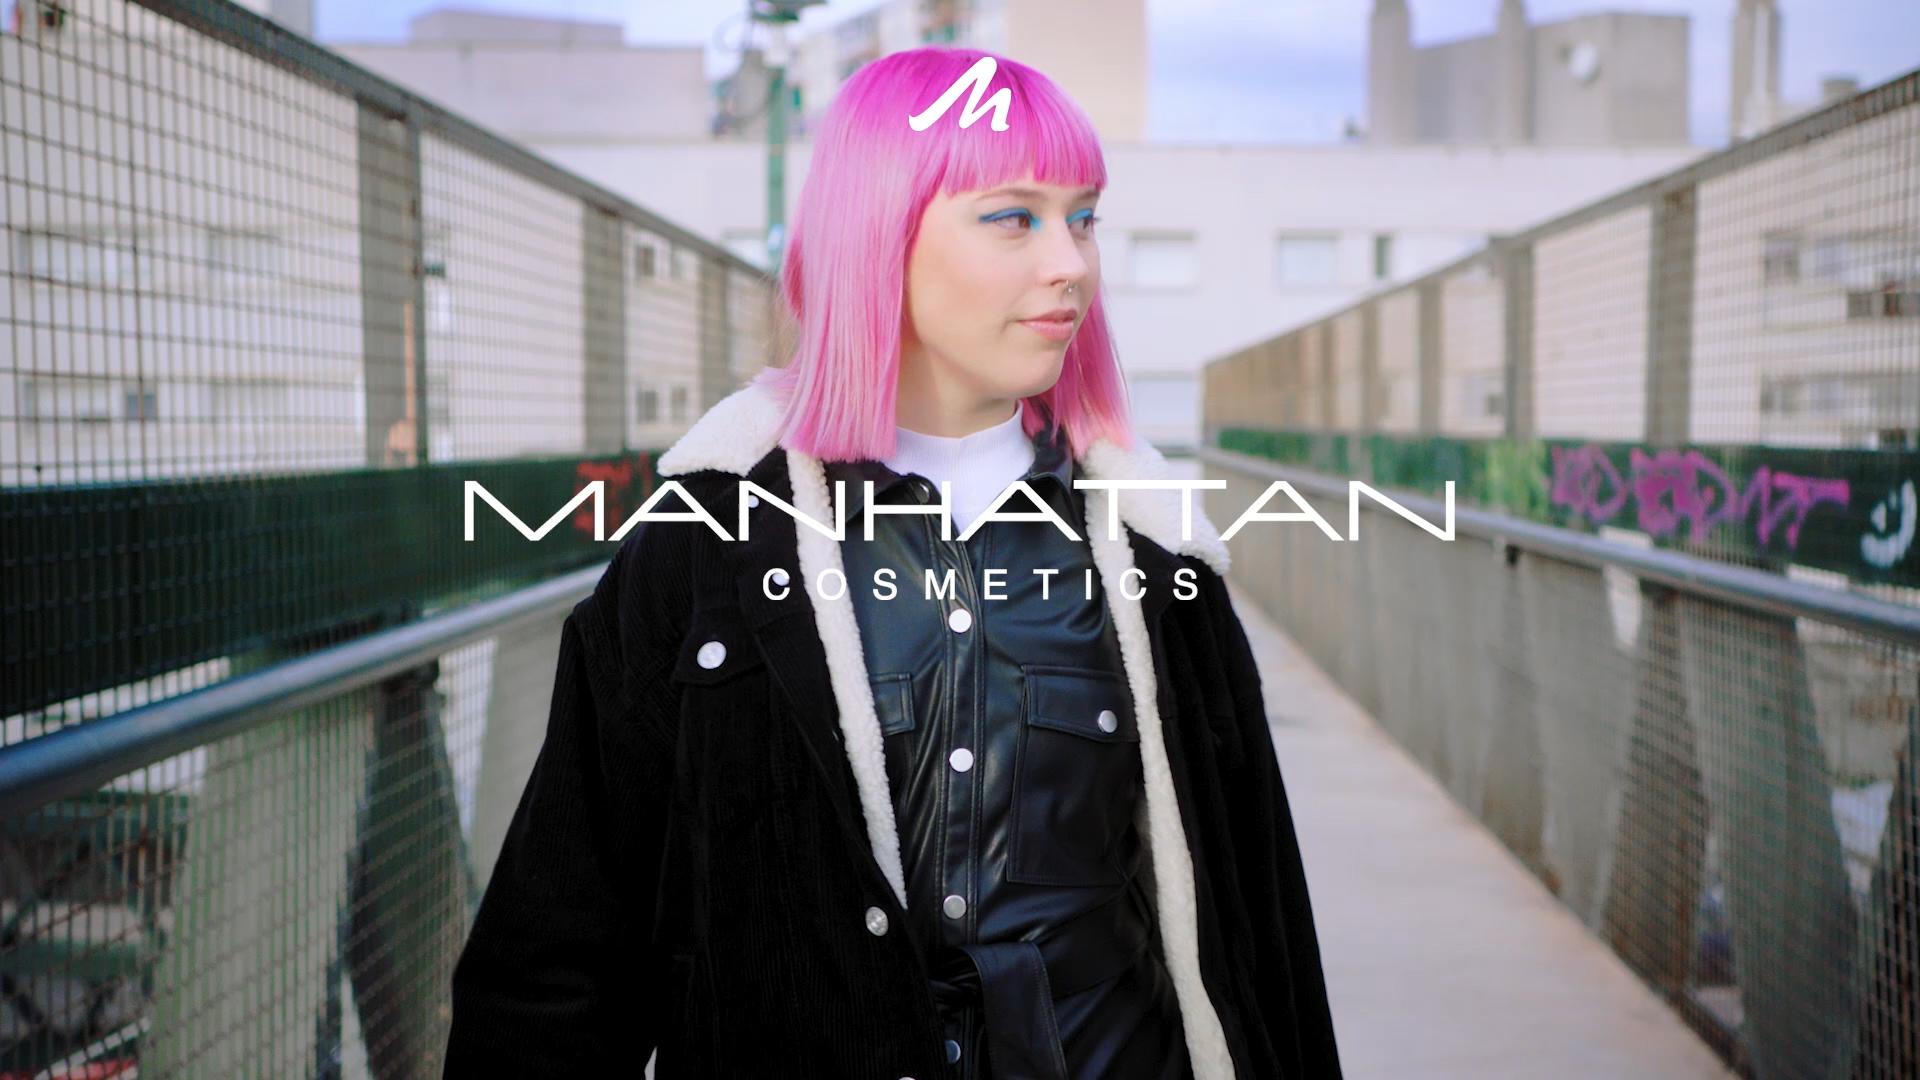 MANHATTAN COSMETICS brand campaign werbefilm